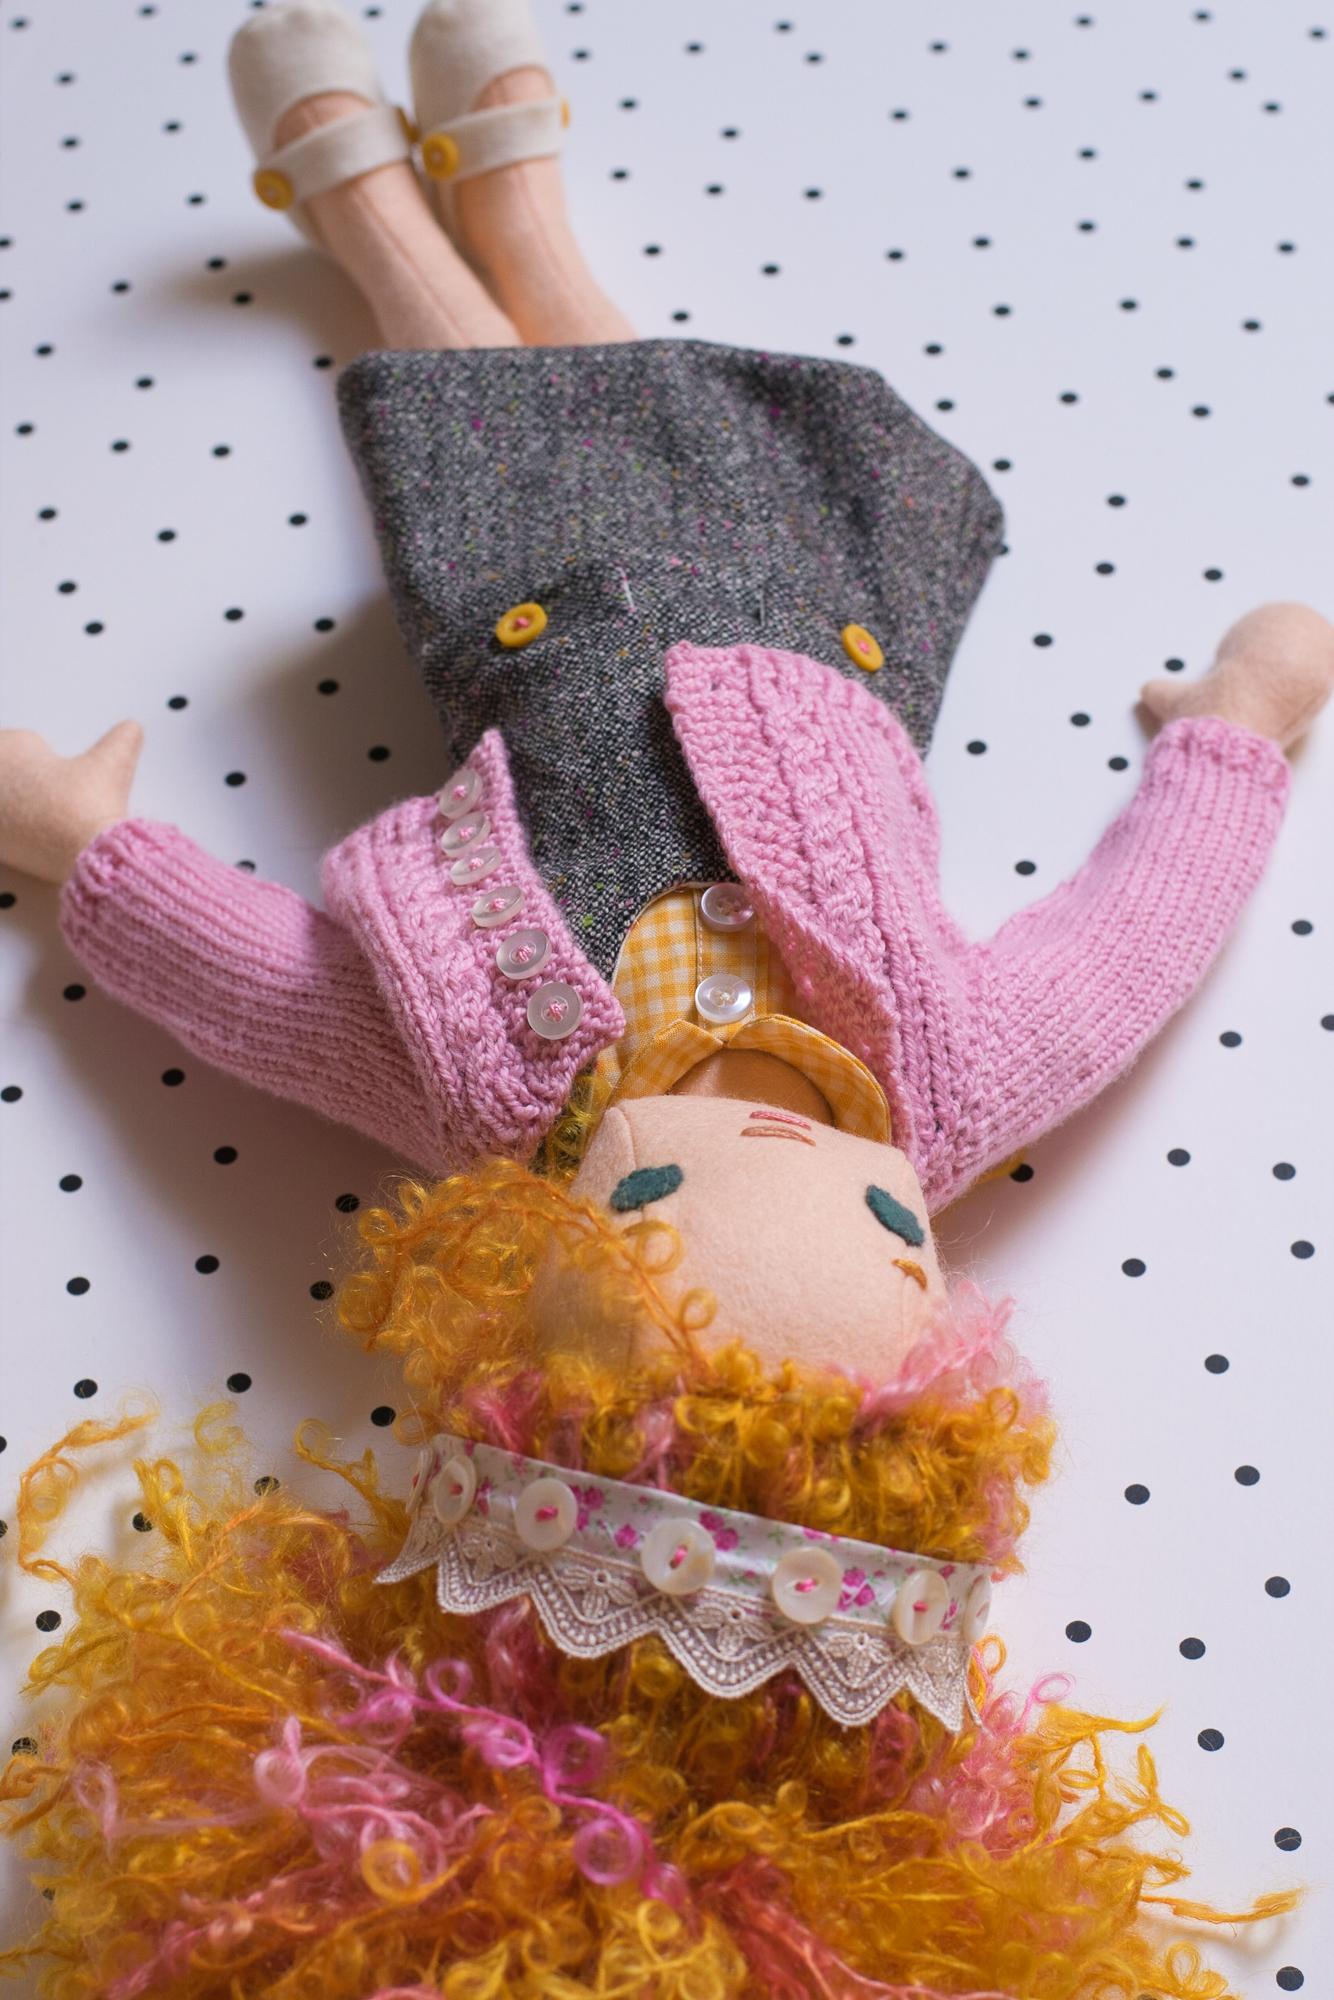 Gallery of Dolls-14.jpg